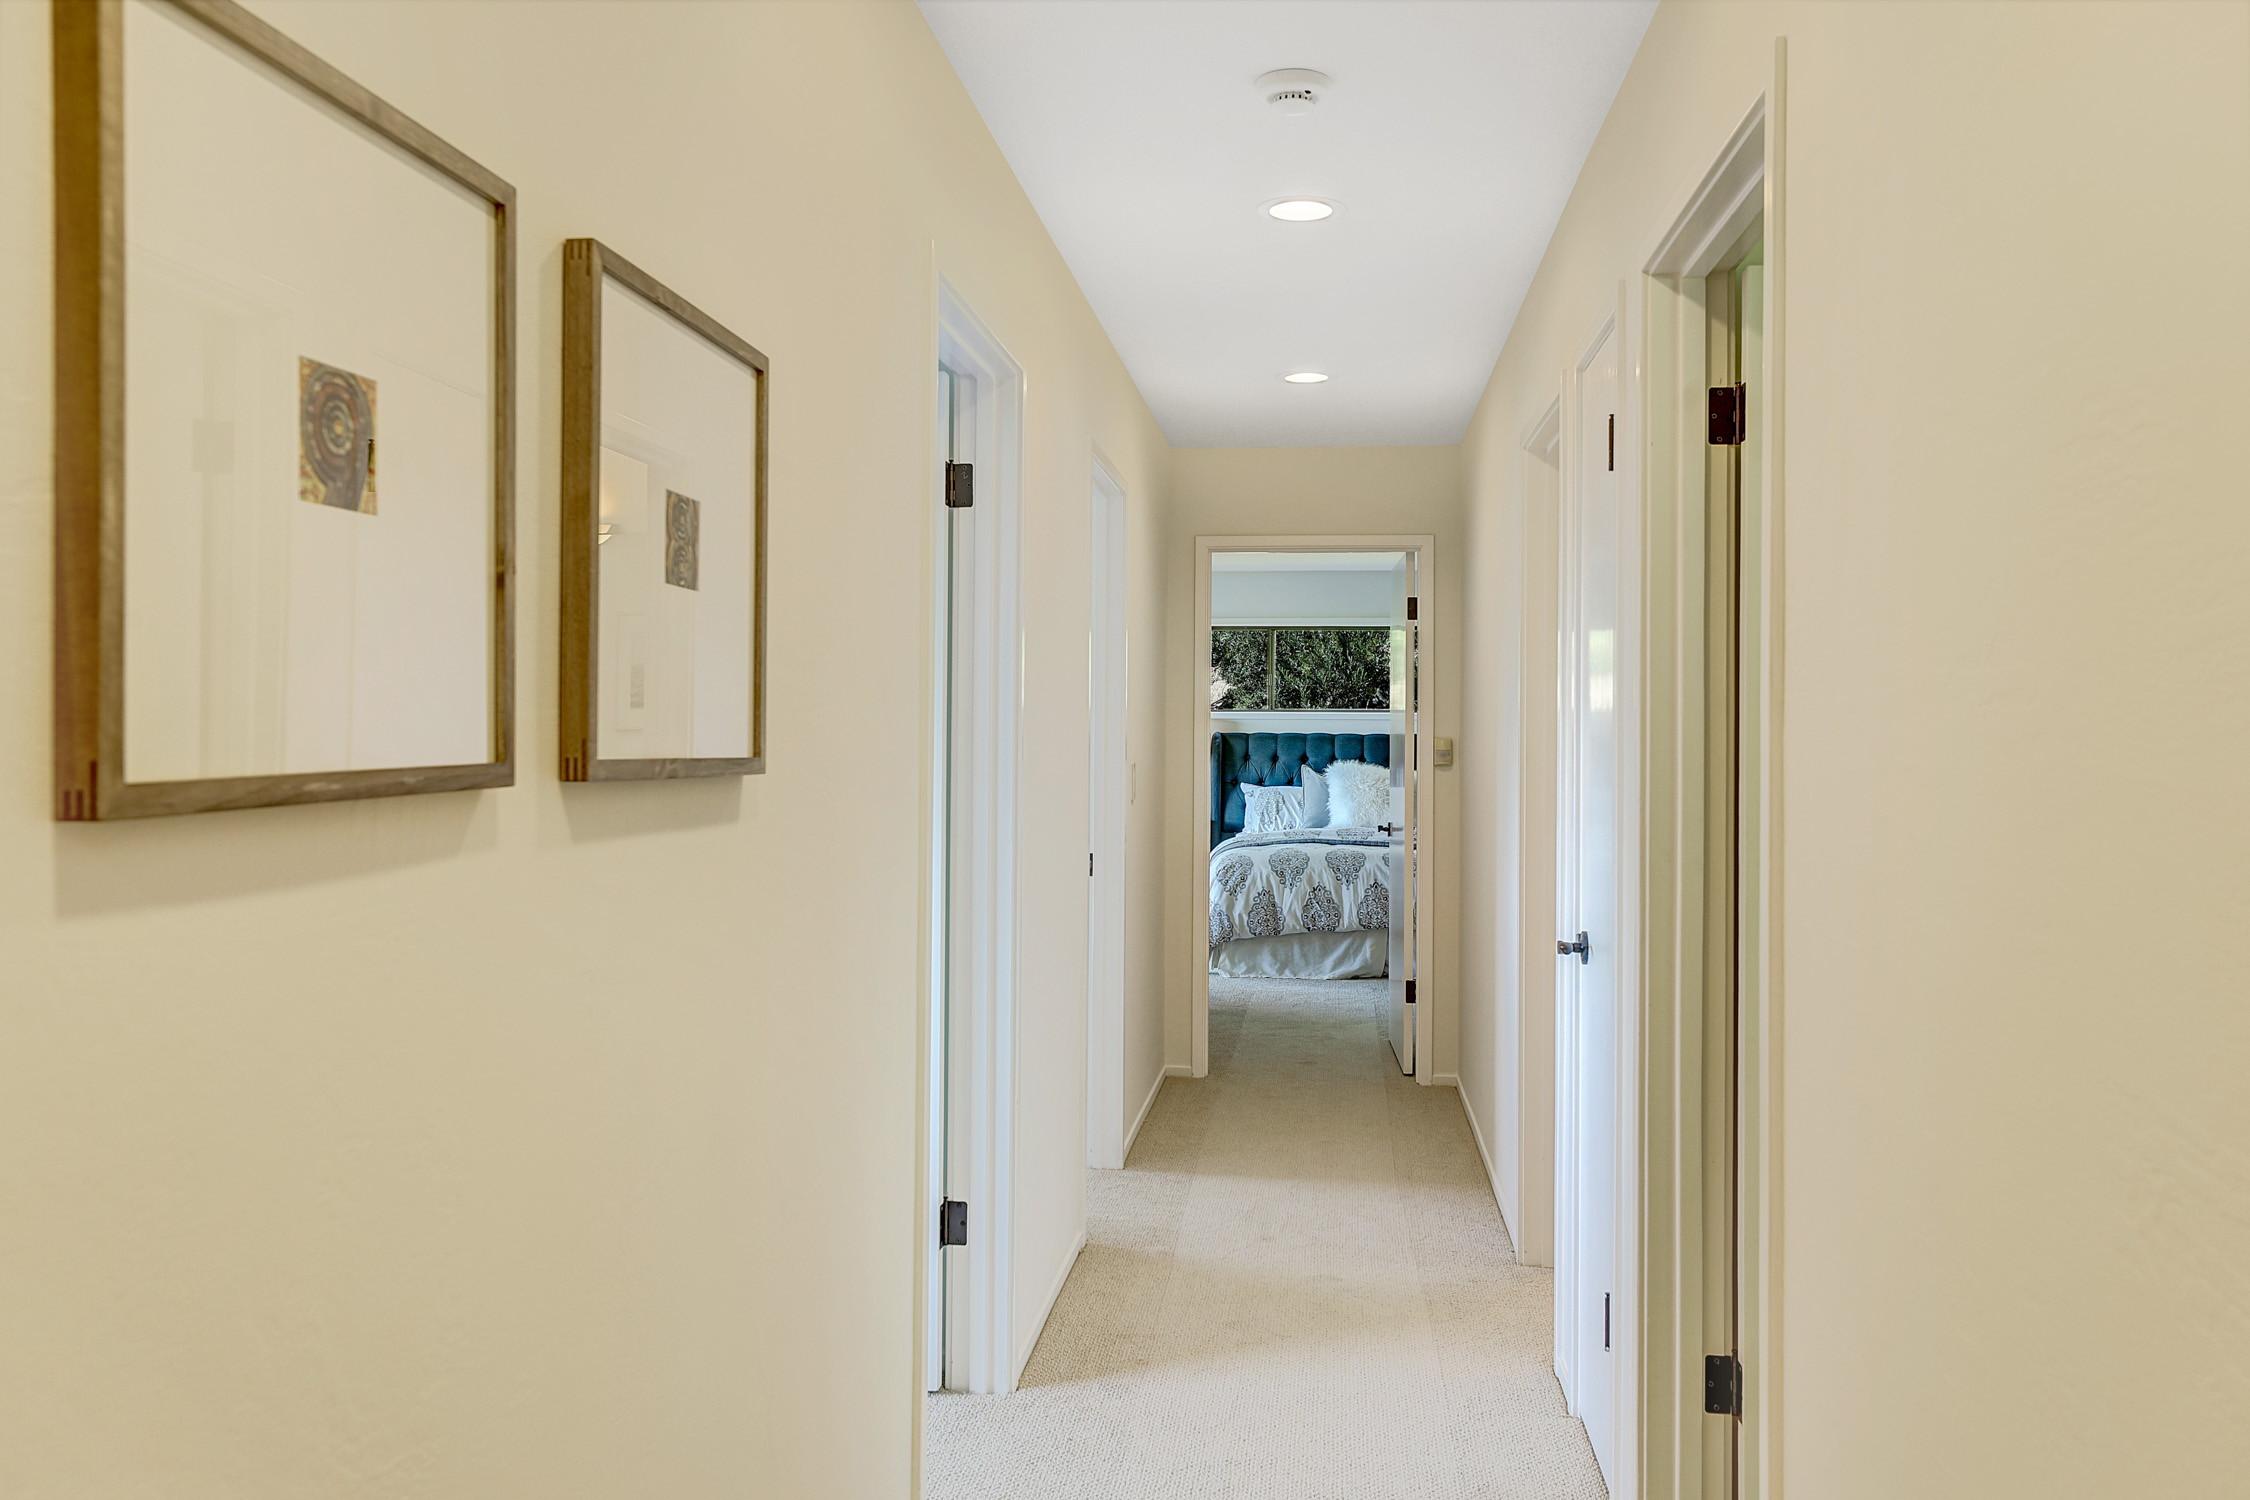 16Dorian 34 MLSSan Rafael Real Estate - Listed by Julia Fitzpatrick + Allie Fornesi Team Own Marin County .jpg